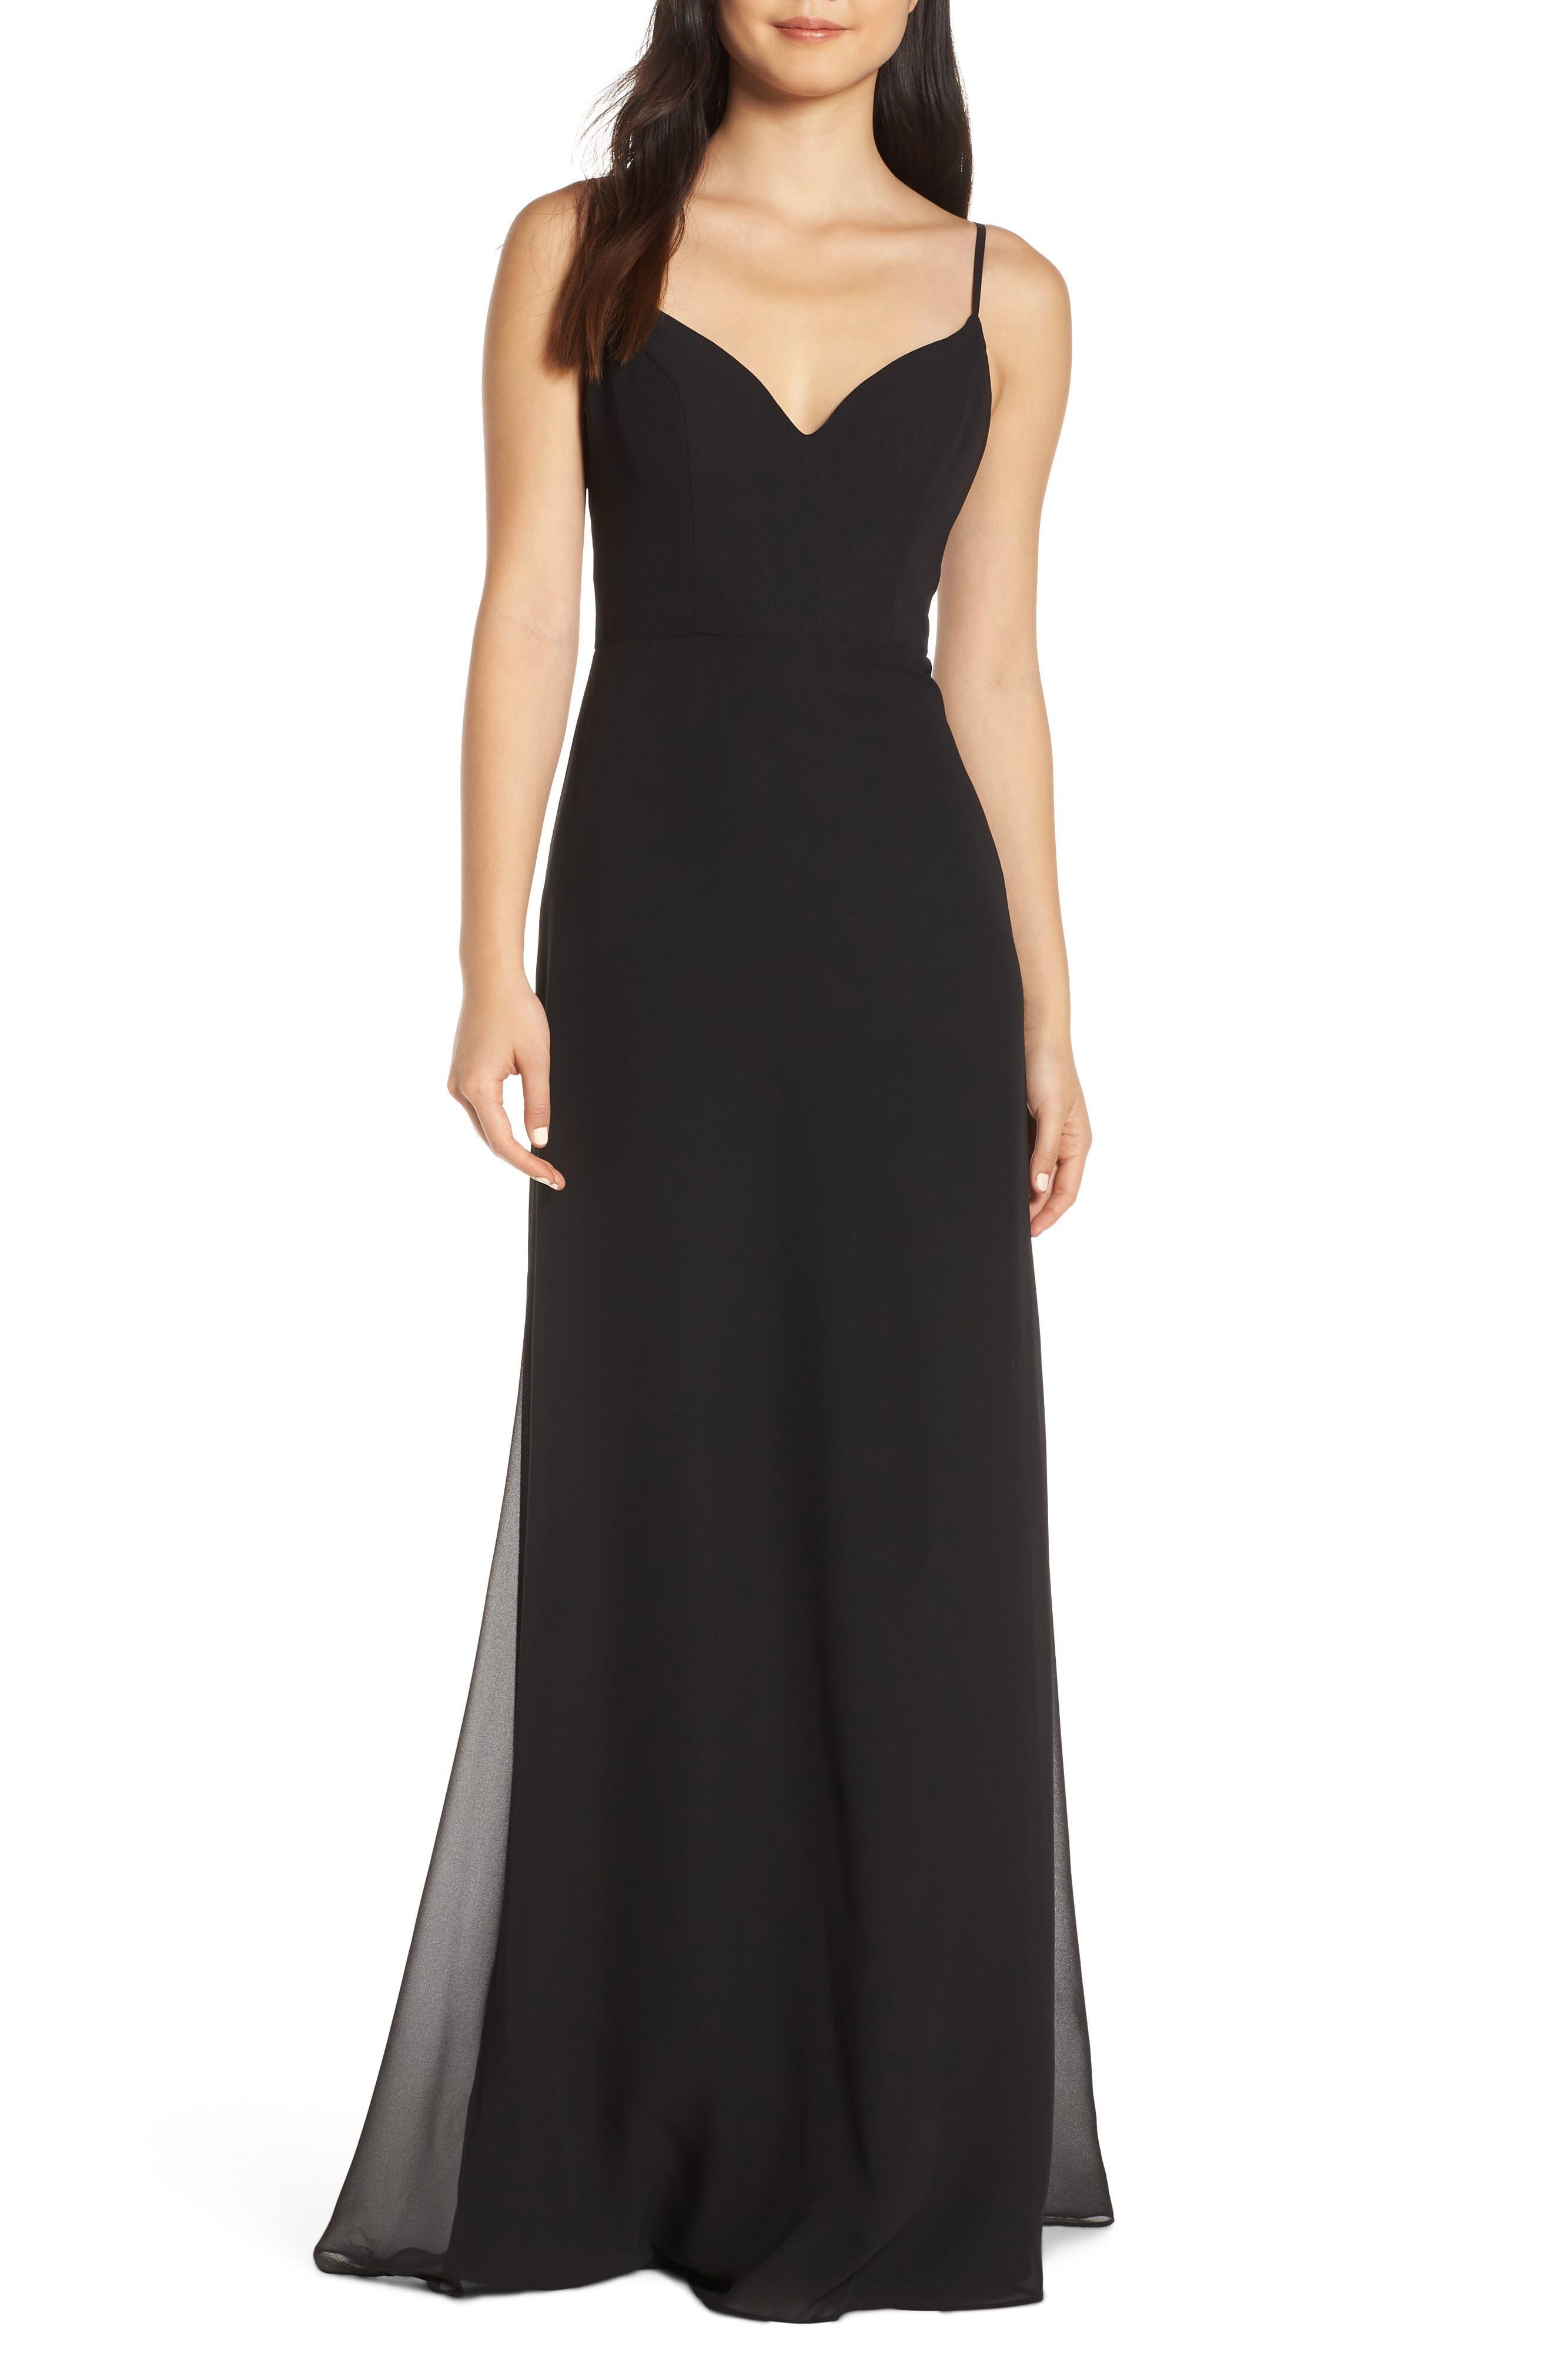 Hayley Paige Occasions V-Neck Chiffon Evening Dress, Black